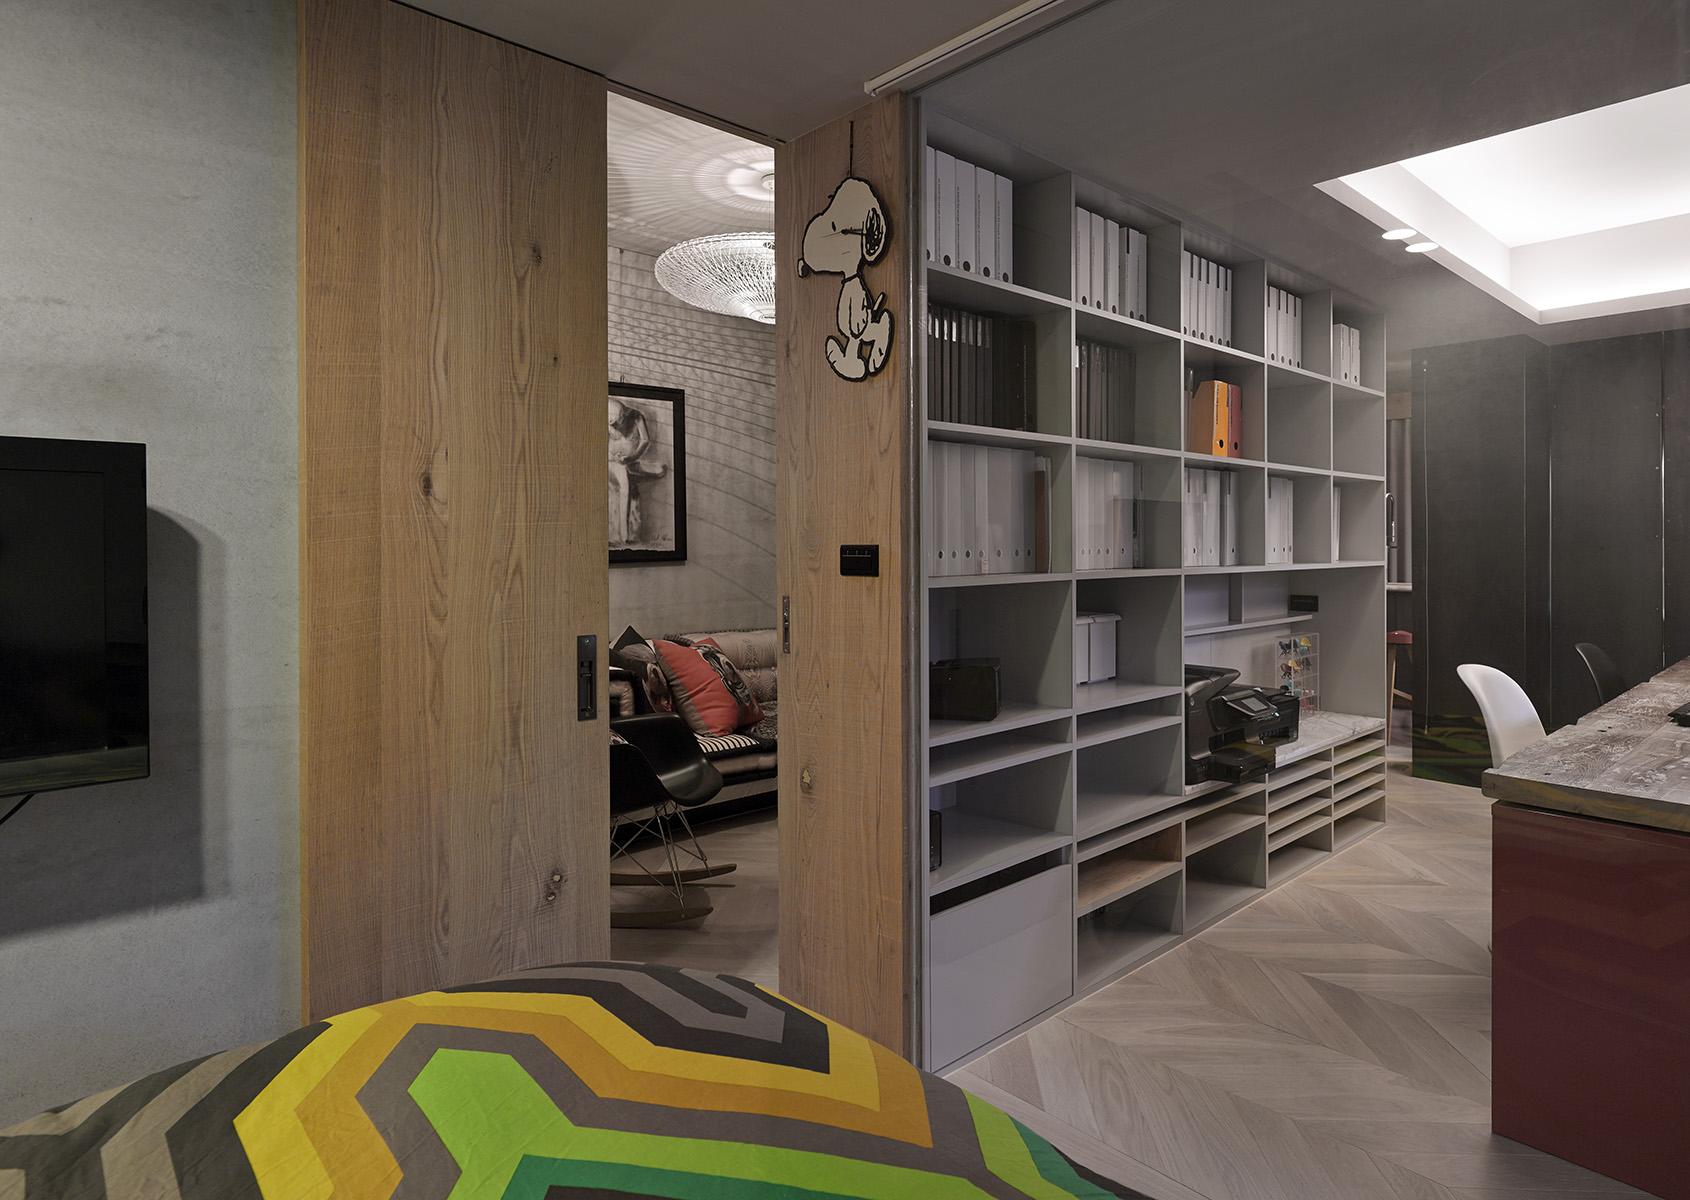 space saving bedroom  Interior Design Ideas